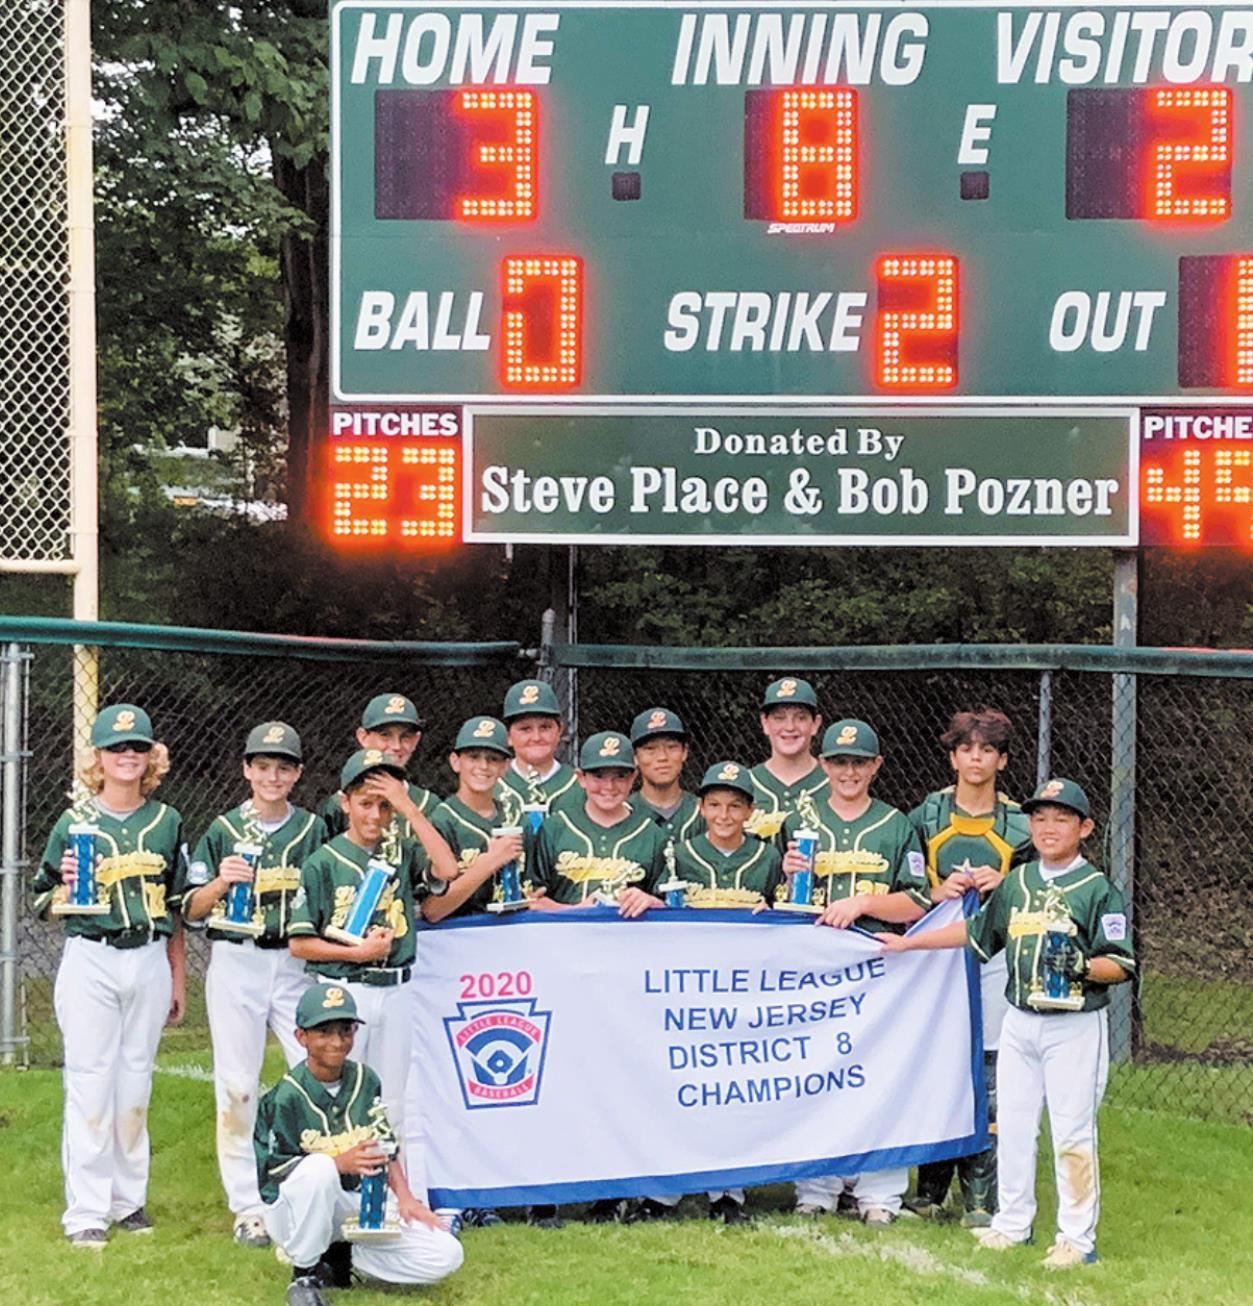 Little League Team Claims Third Consecutive District Title